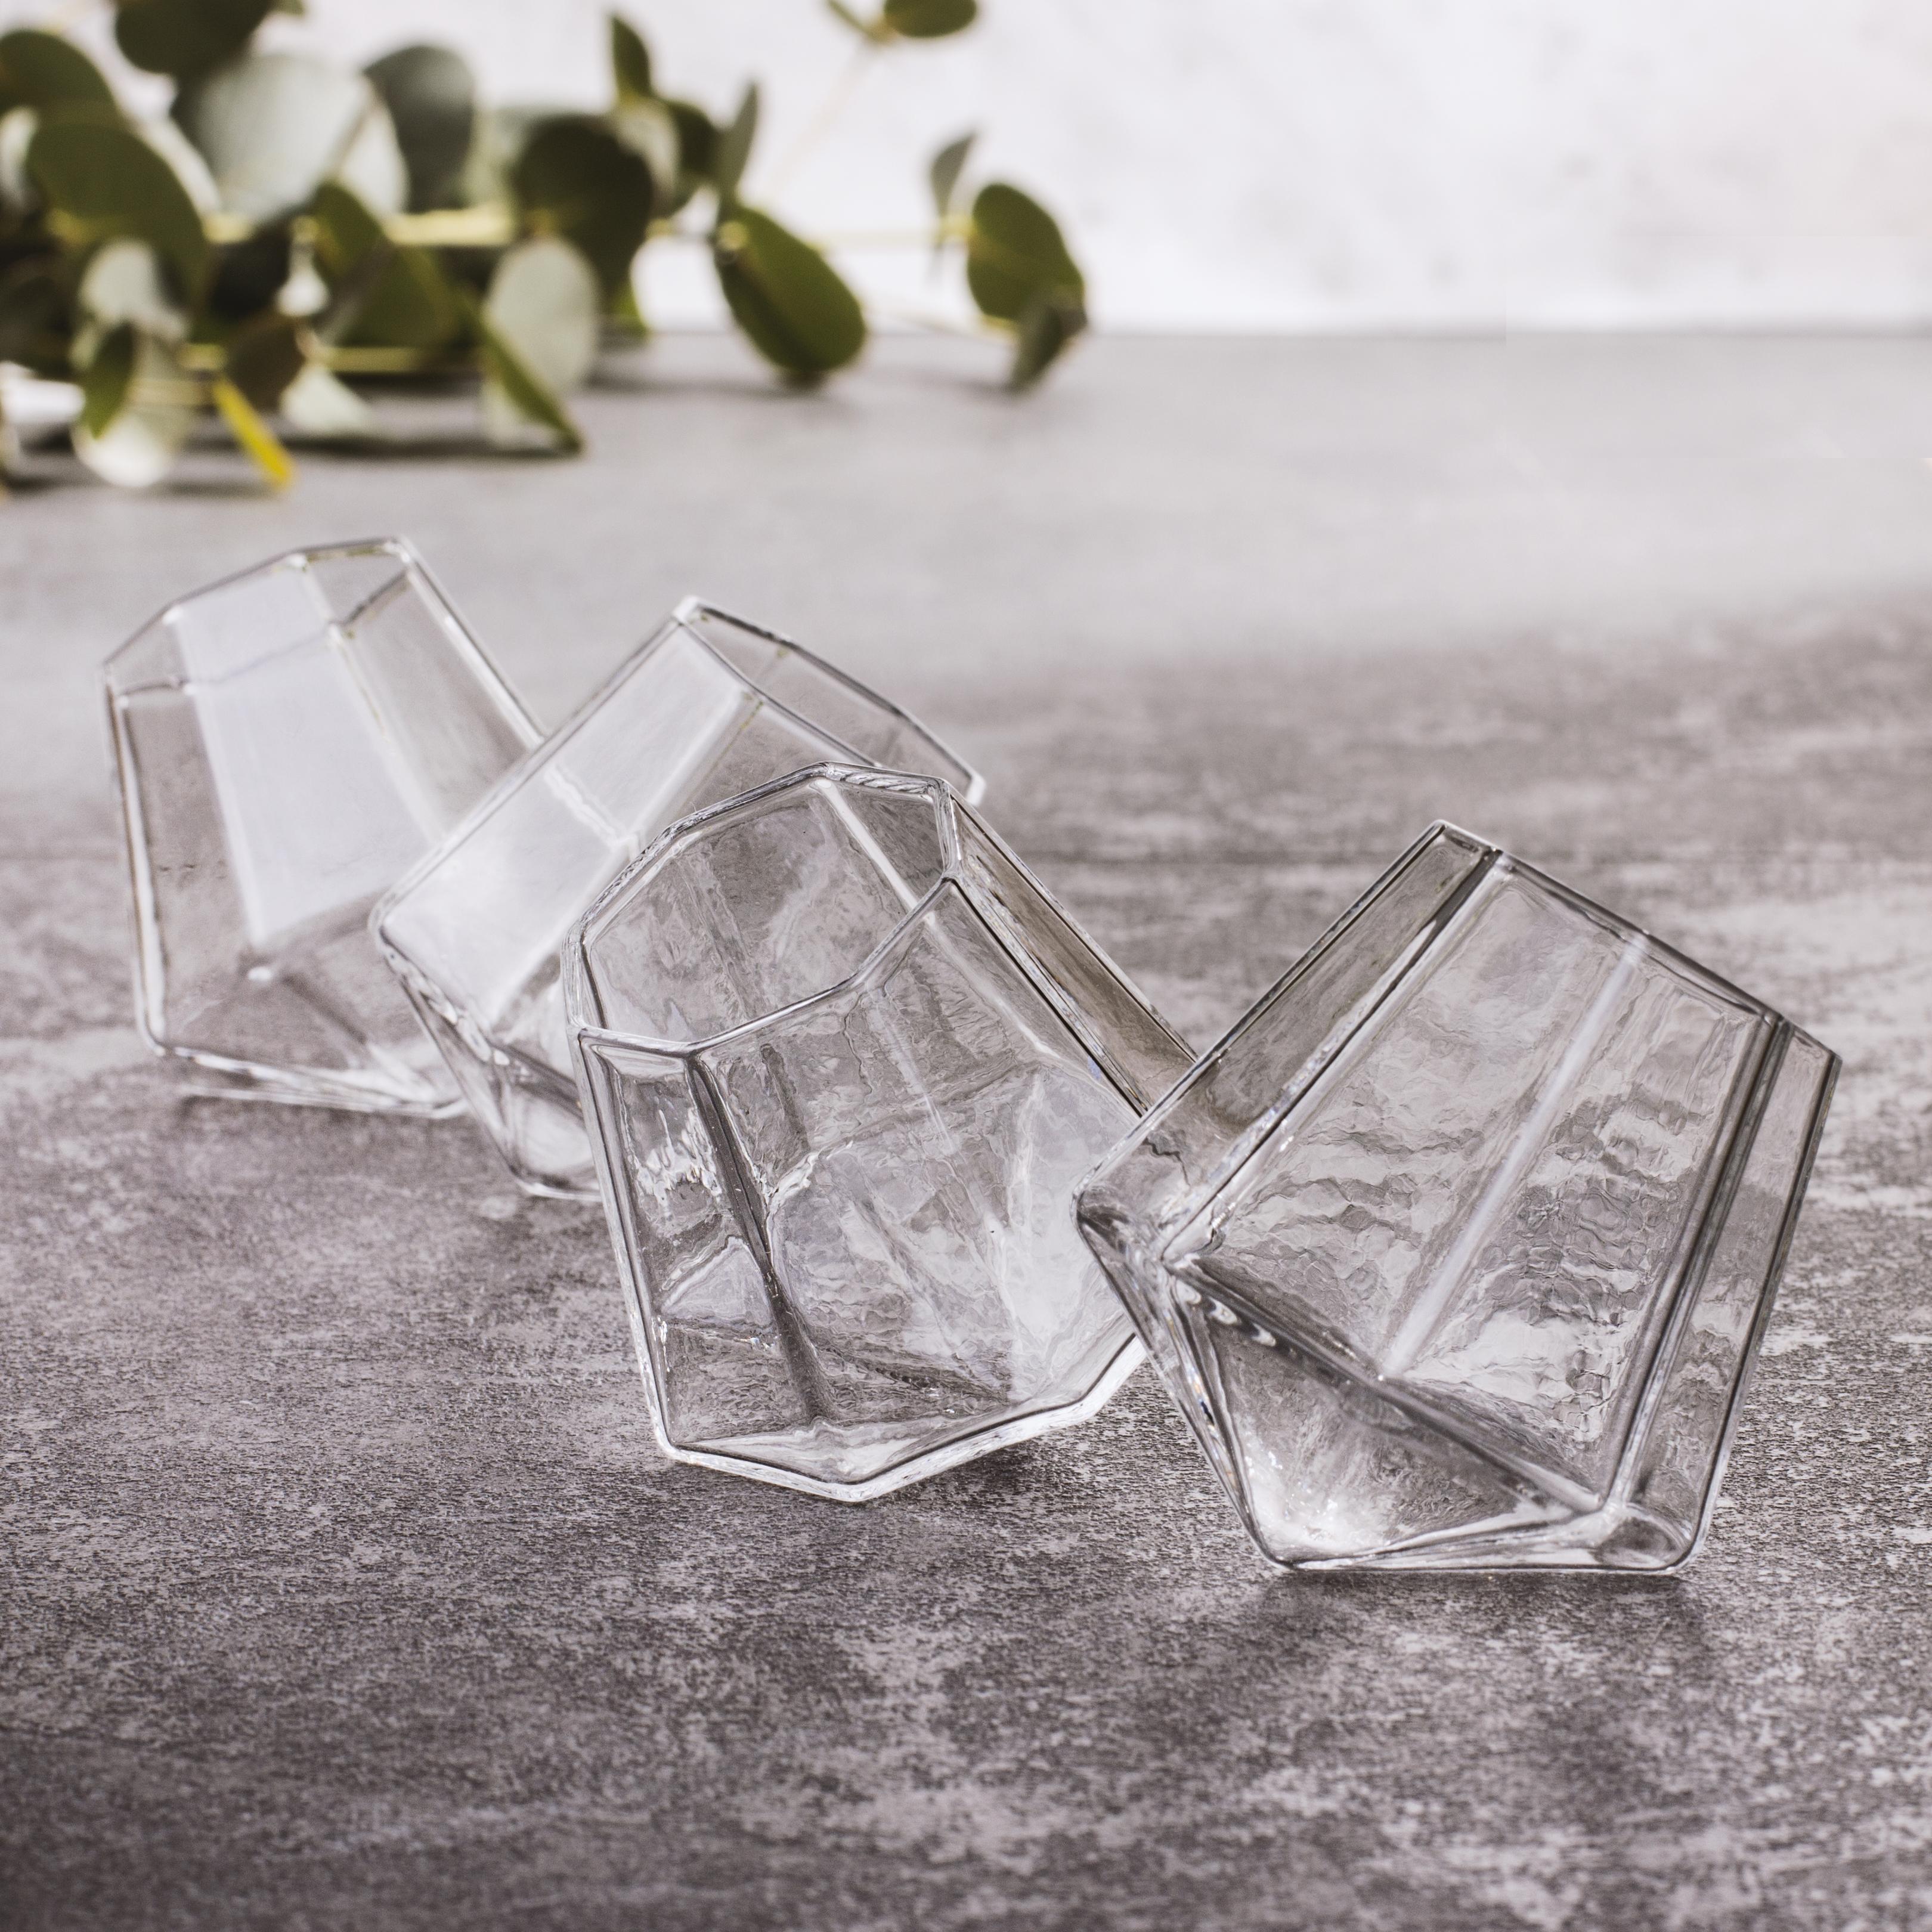 Thumbs Up SO-DIASHT4 - 50 ml - 4 Stück(e) - Glas - Transparent - 98 g - 66 cm